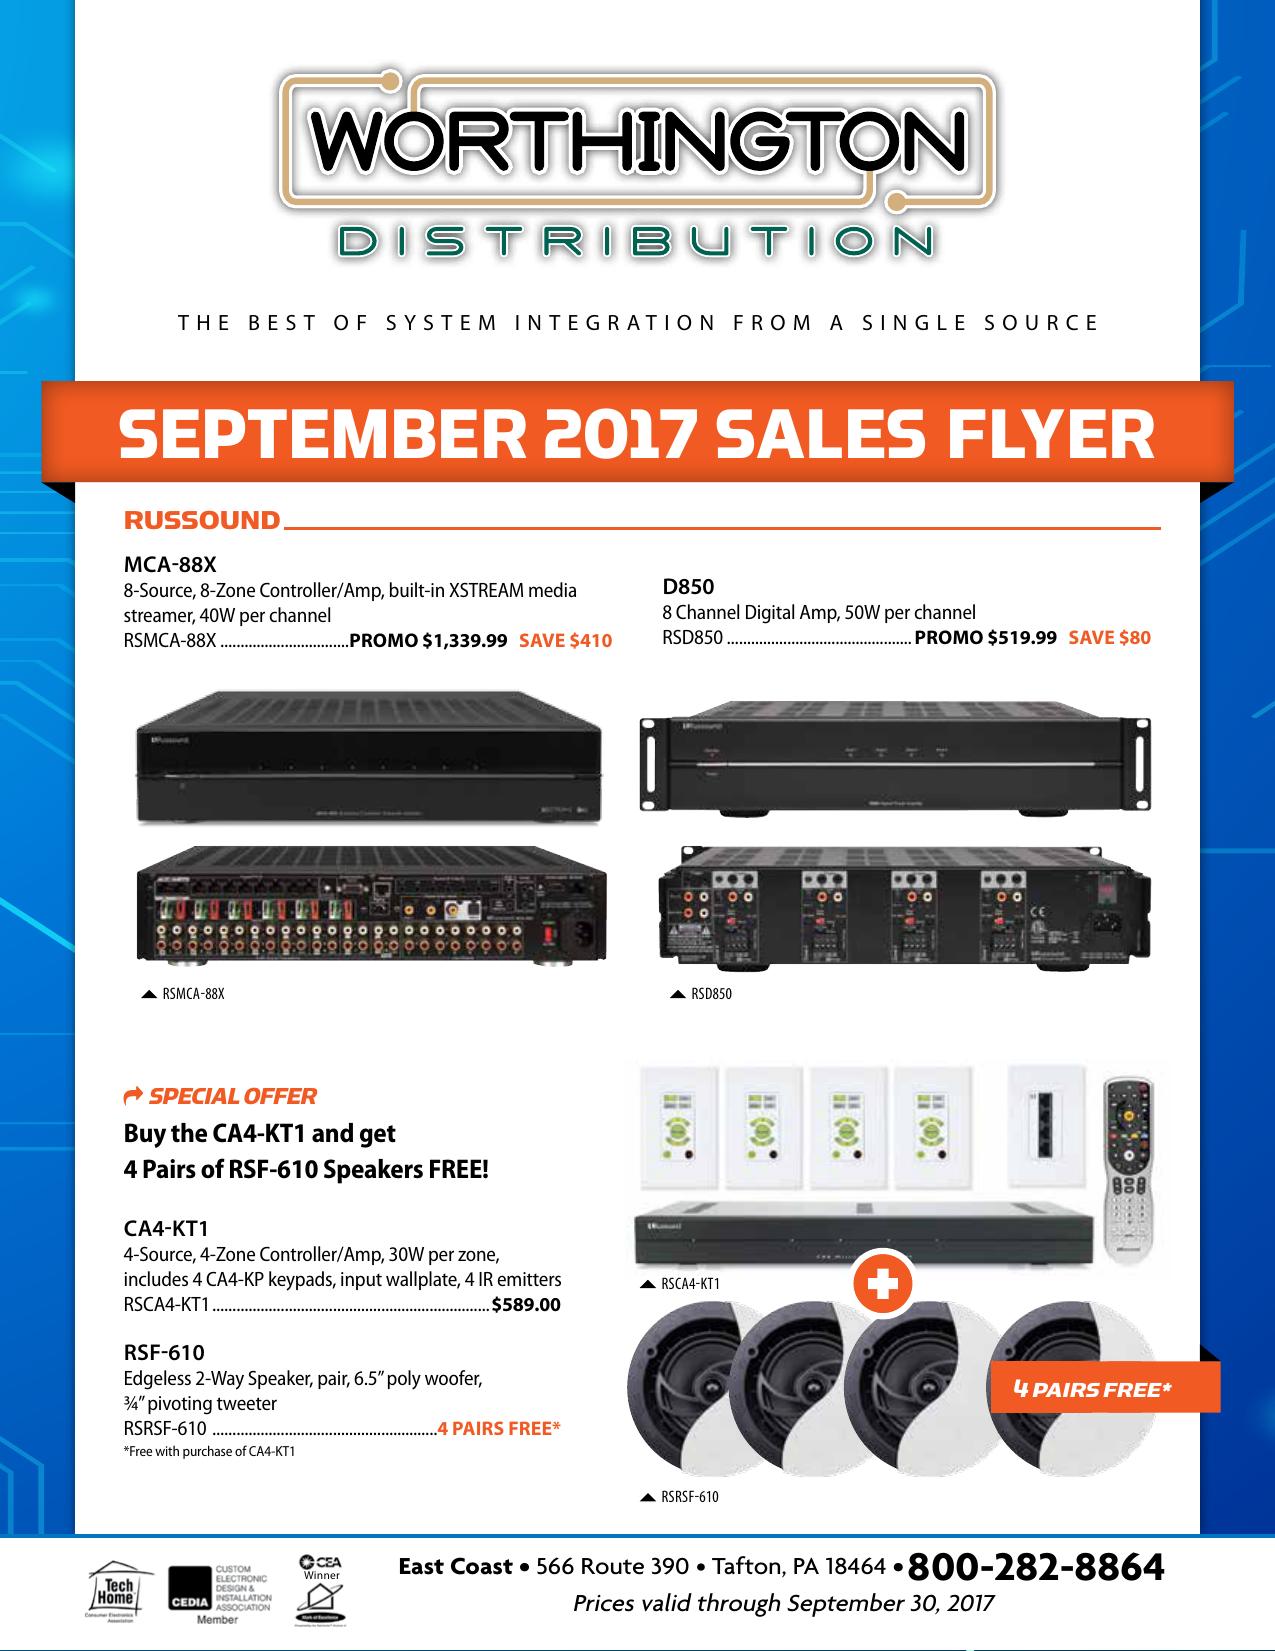 july 2017 sales flyer - Worthington Distribution   manualzz com